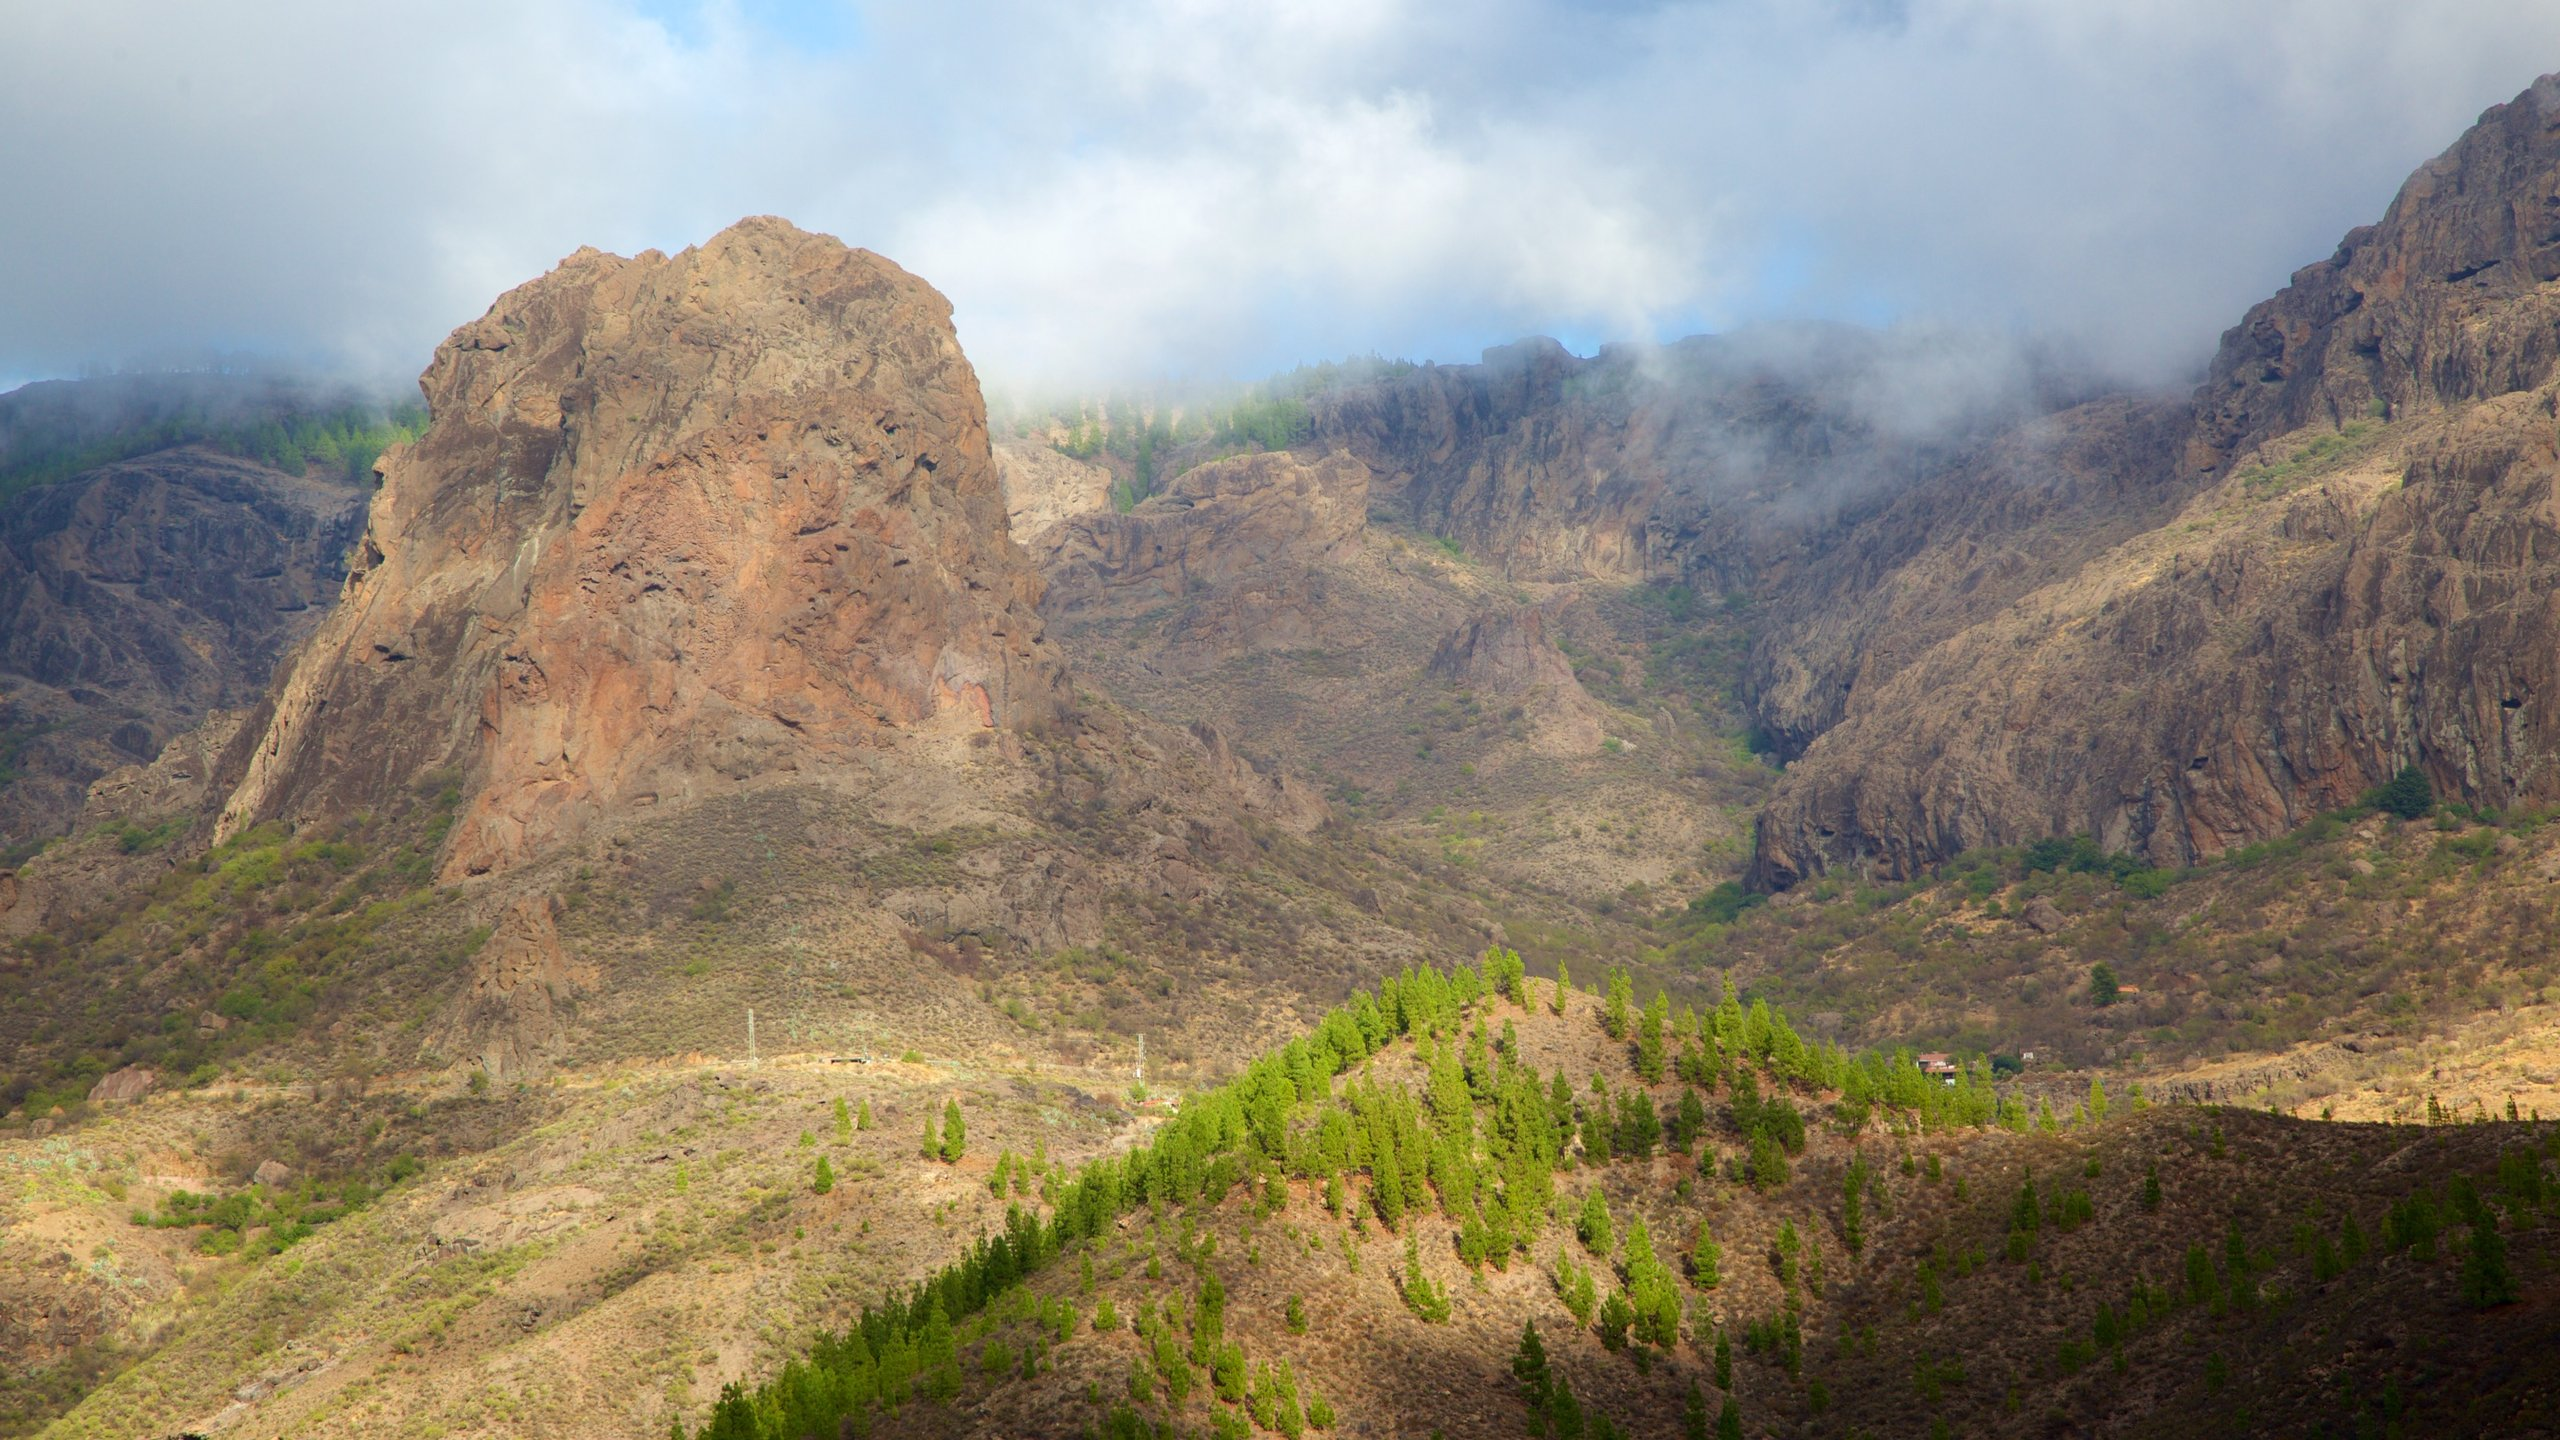 San Bartolome de Tirajana, Canary Islands, Spain